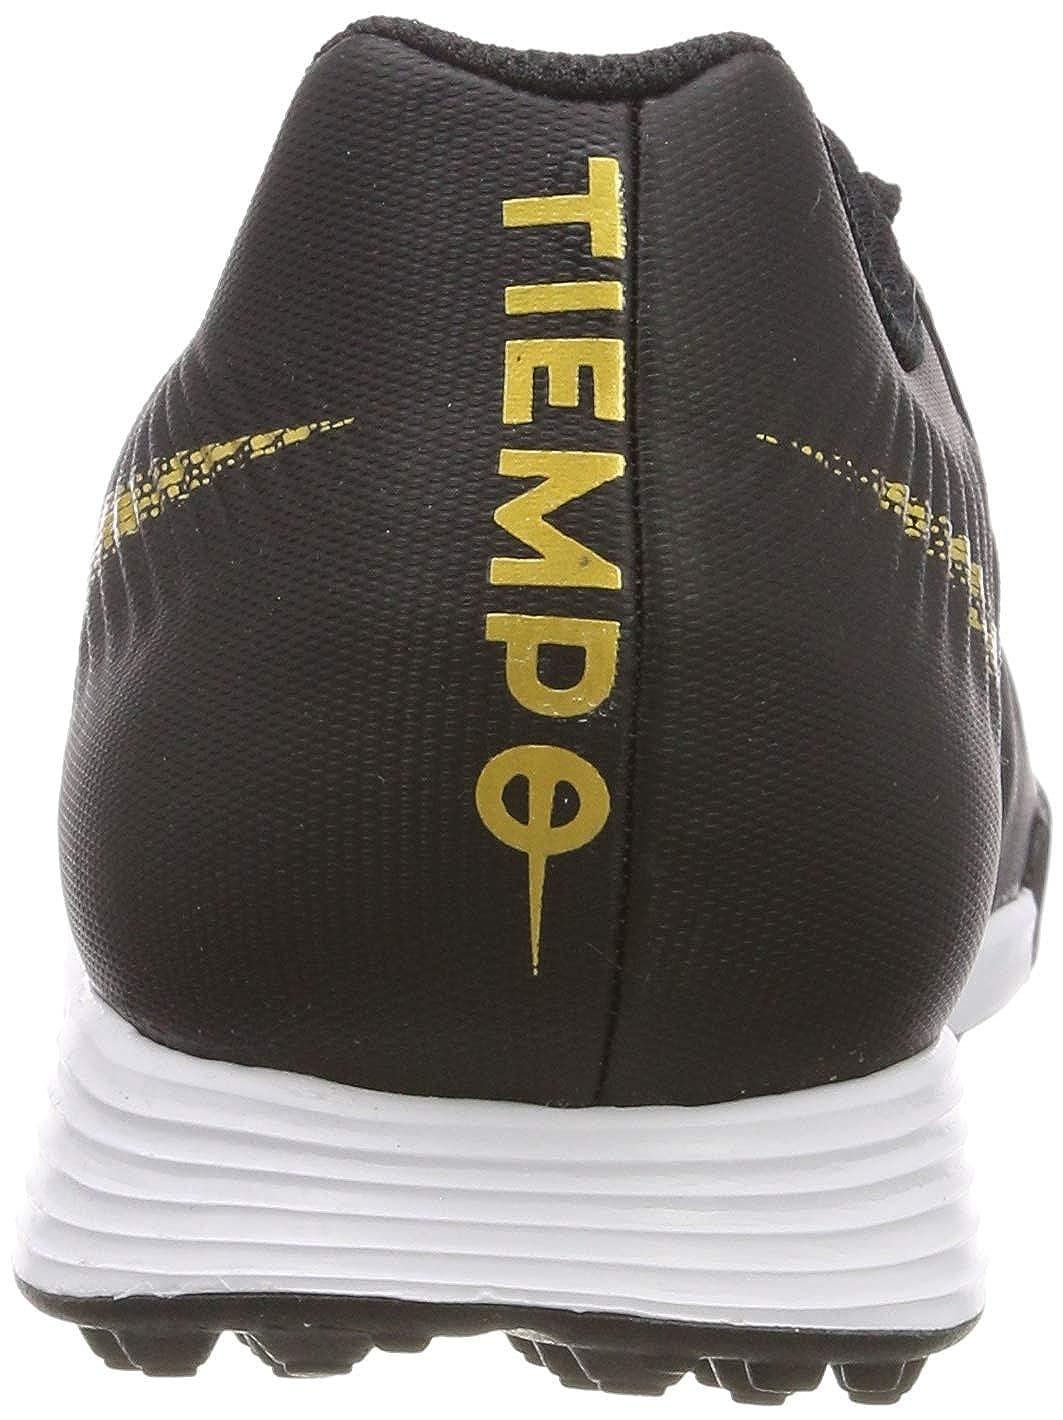 reputable site 7702b fbc8b Nike Herren Legendx 7 Academy Tf Fußballschuhe  Amazon.de  Schuhe    Handtaschen